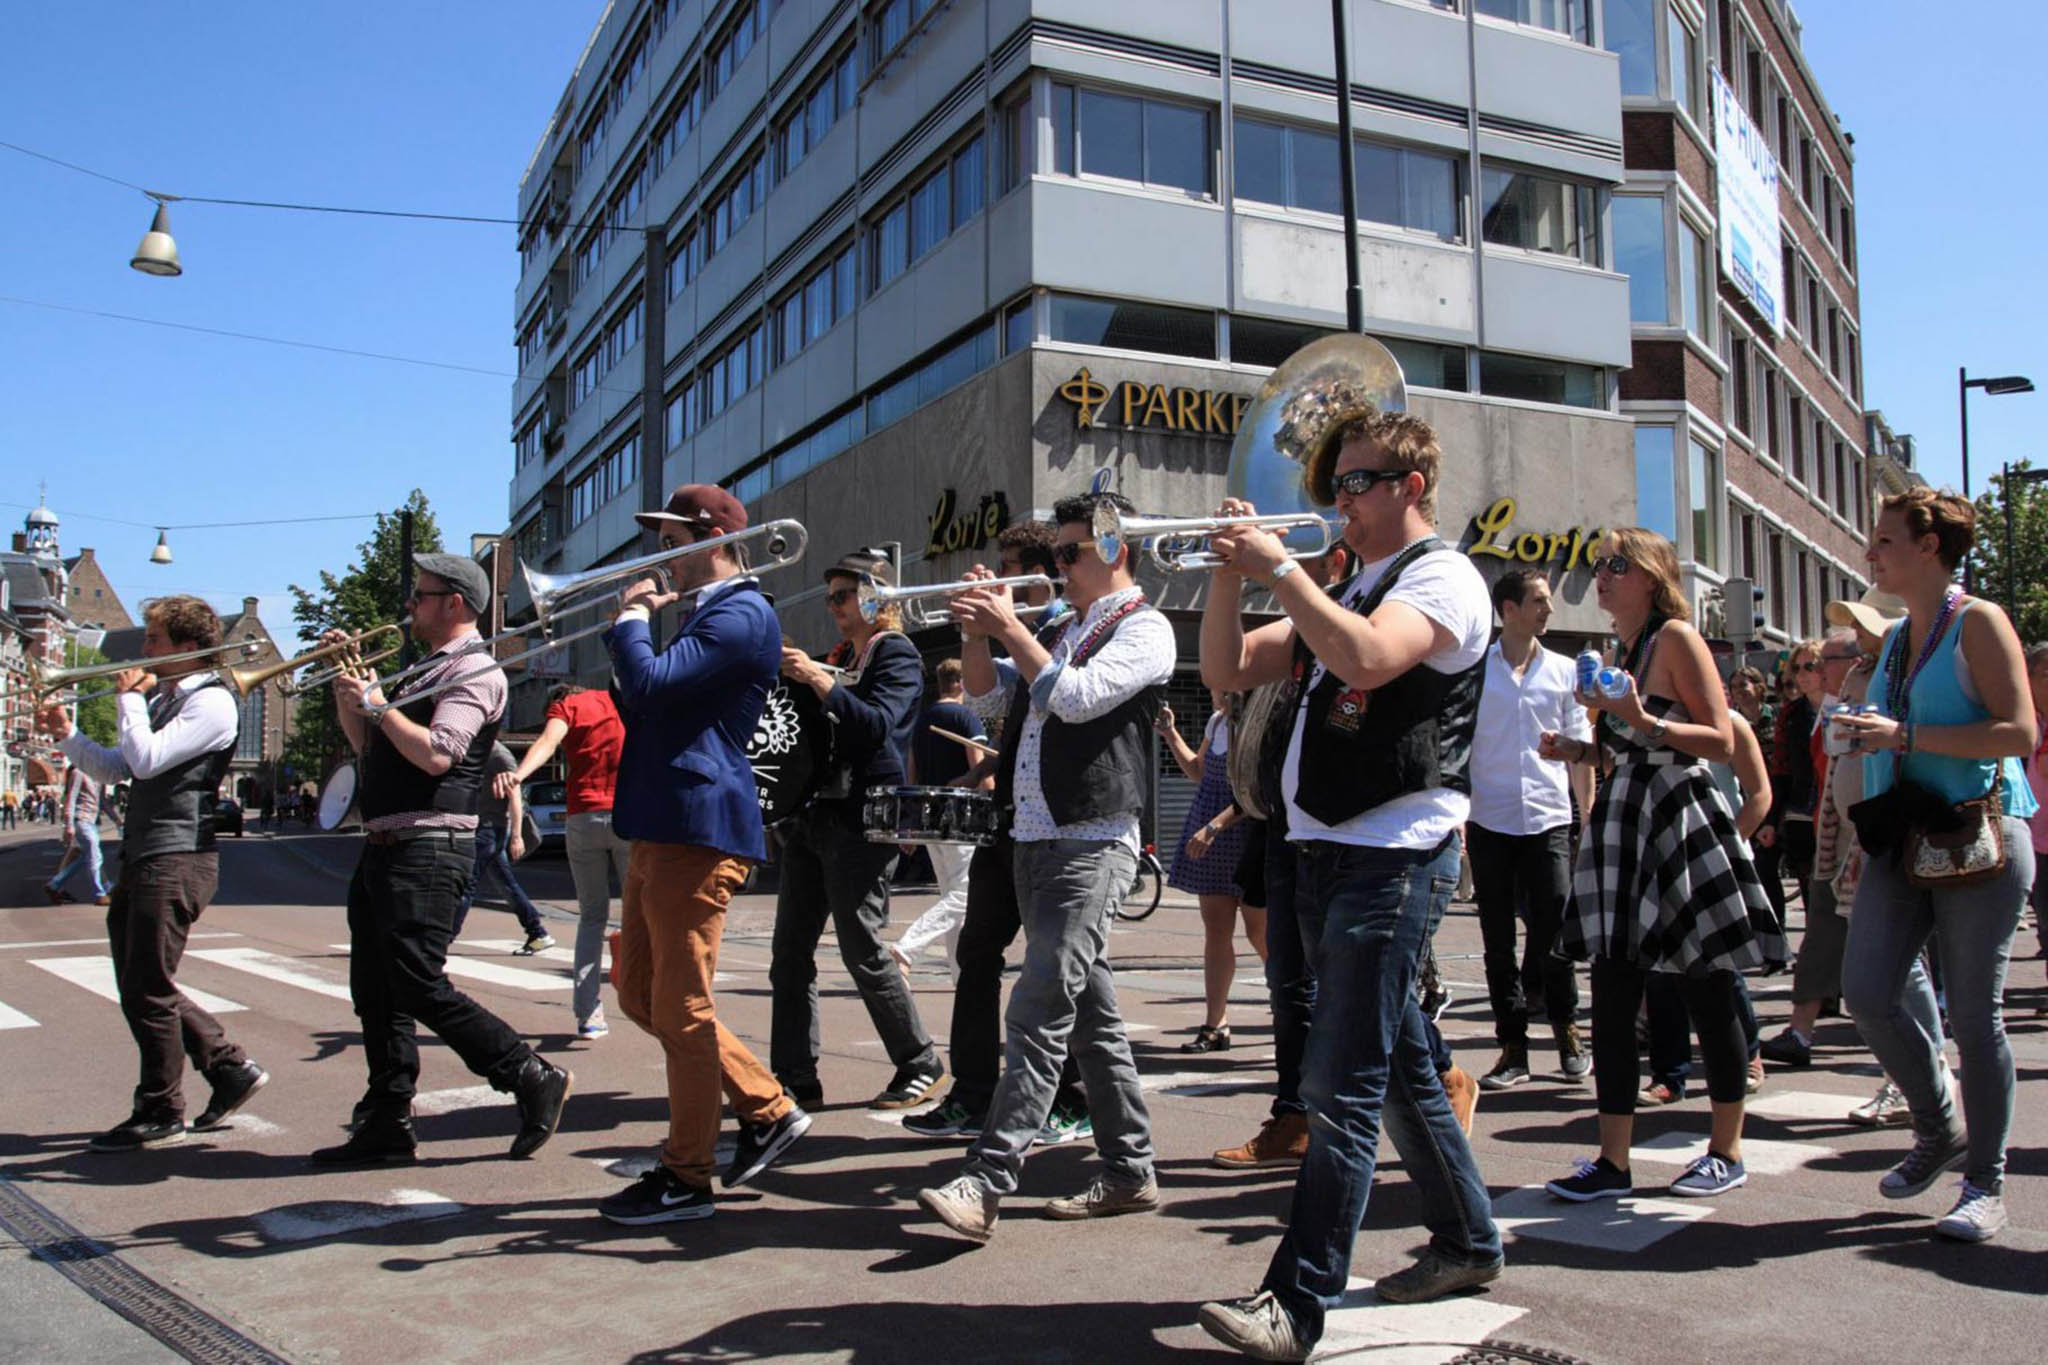 VPRO 3voor12/Utrecht Klein New Orleans Festival parade